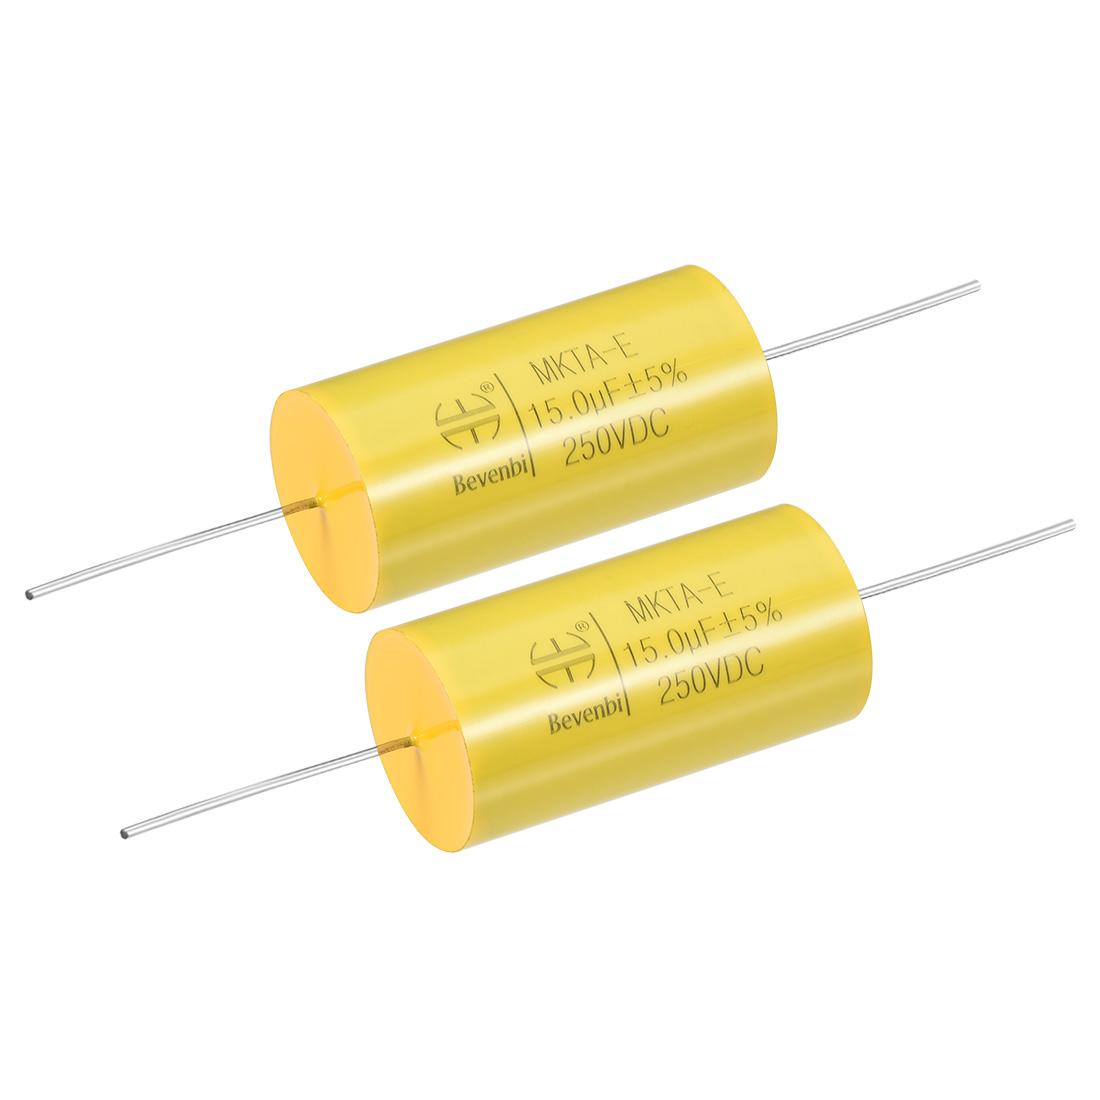 Film Capacitor 250V DC 15.0uF MKTA-E Round Polypropylene Capacitors Yellow 2pcs